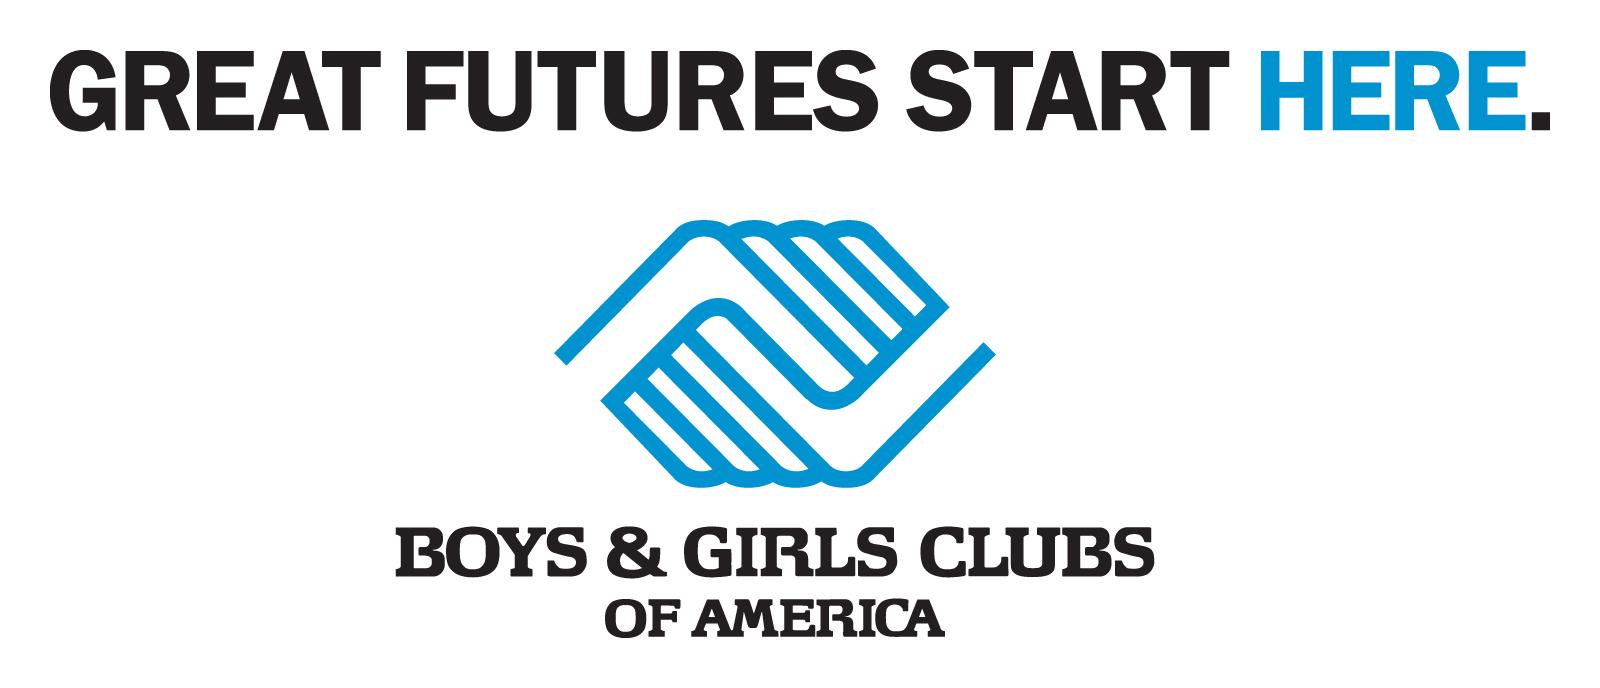 Boys girls clubs of america